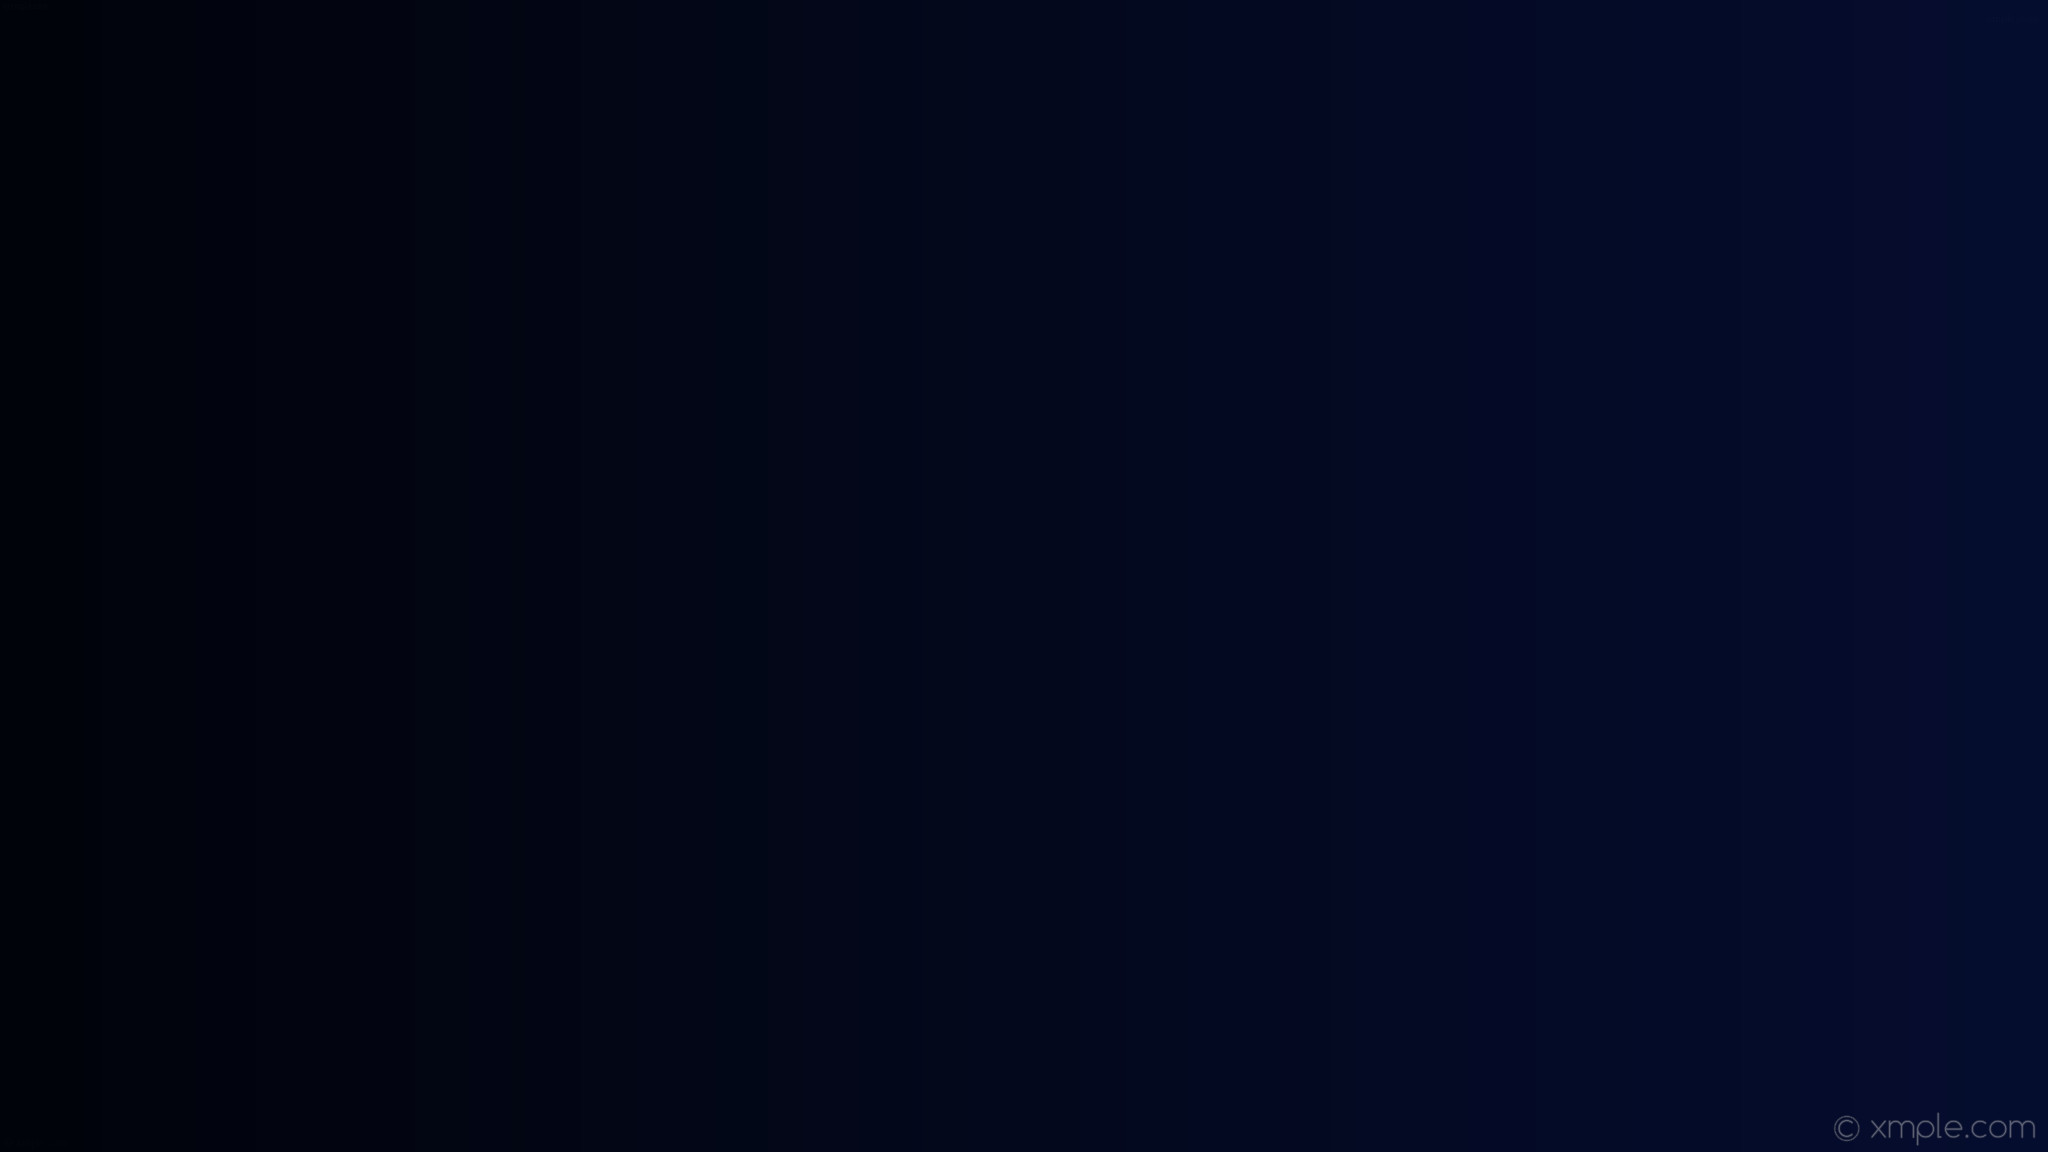 wallpaper linear blue black gradient dark blue #050d2f #01030a 0°